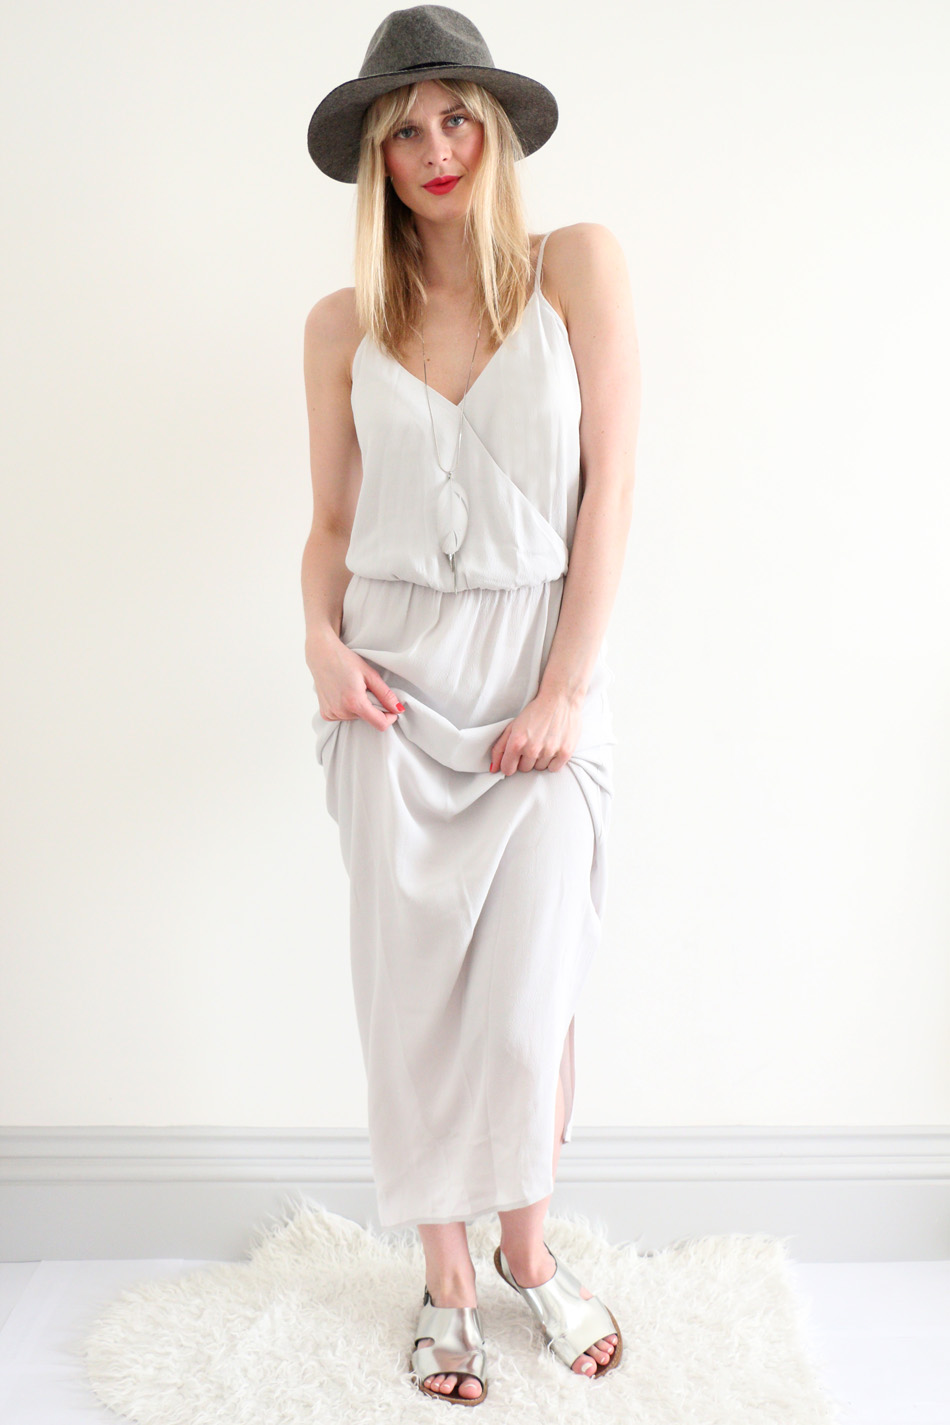 FD American Vintage dress IMG_1067 950px